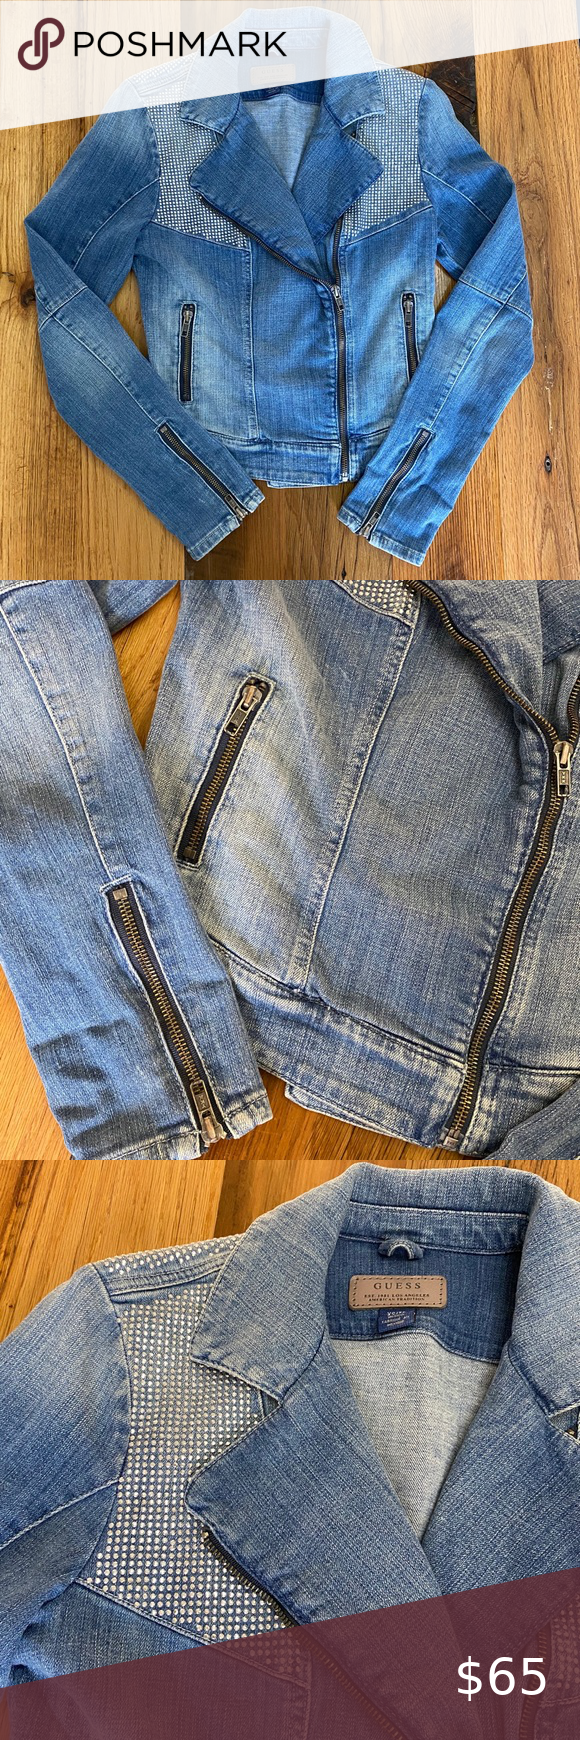 Guess Denim Jacket With Zipper Detail Vintage Denim Jeans Vintage Denim Jacket Denim Jacket Women [ 1740 x 580 Pixel ]